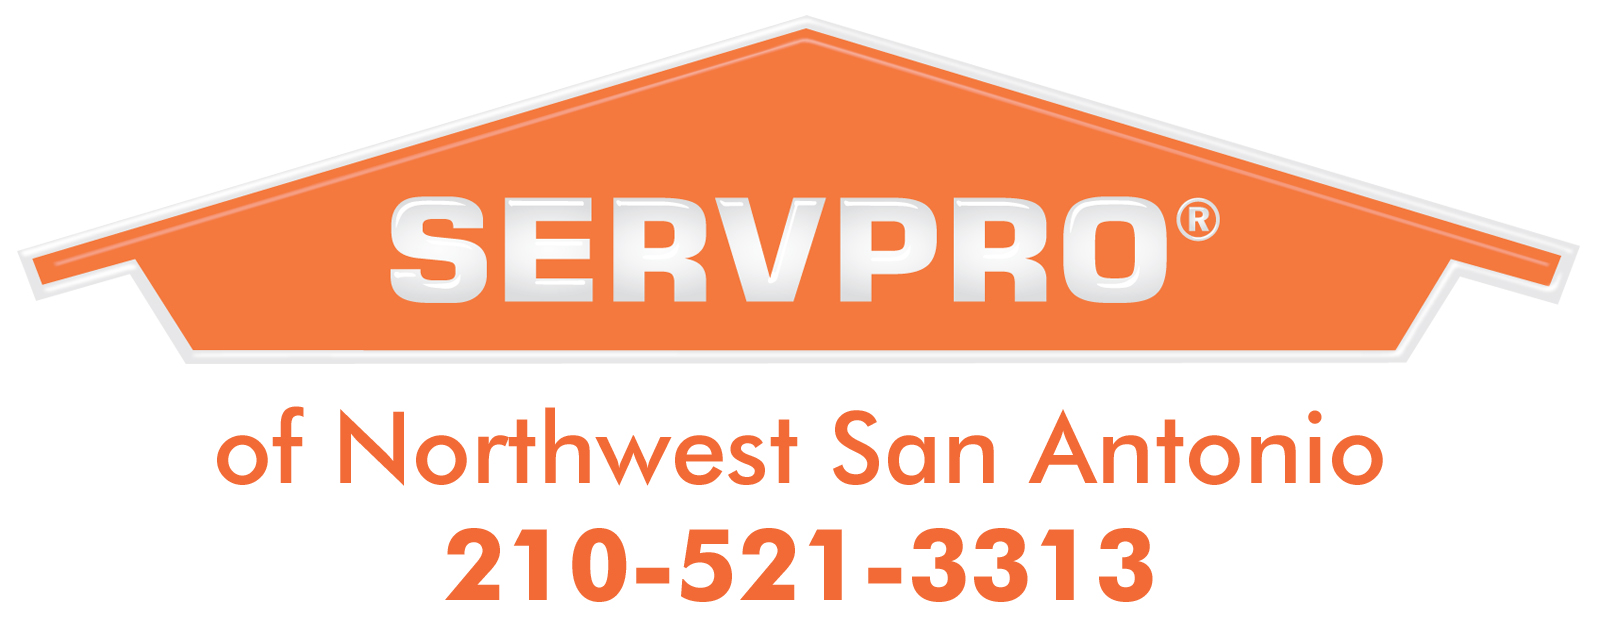 ServPro of Northwest San Antonio